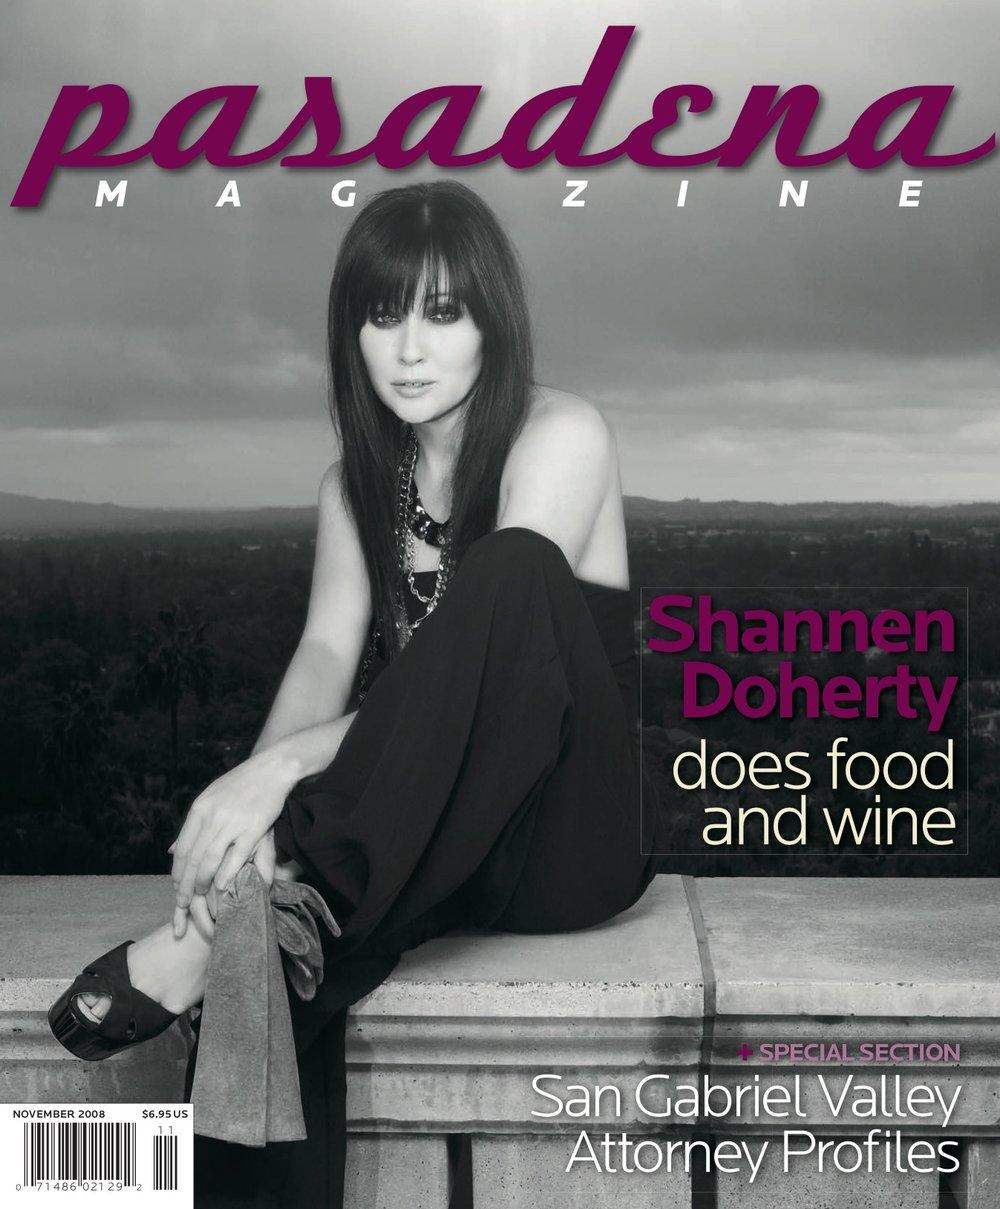 Pasadena Magazine Cover.jpg